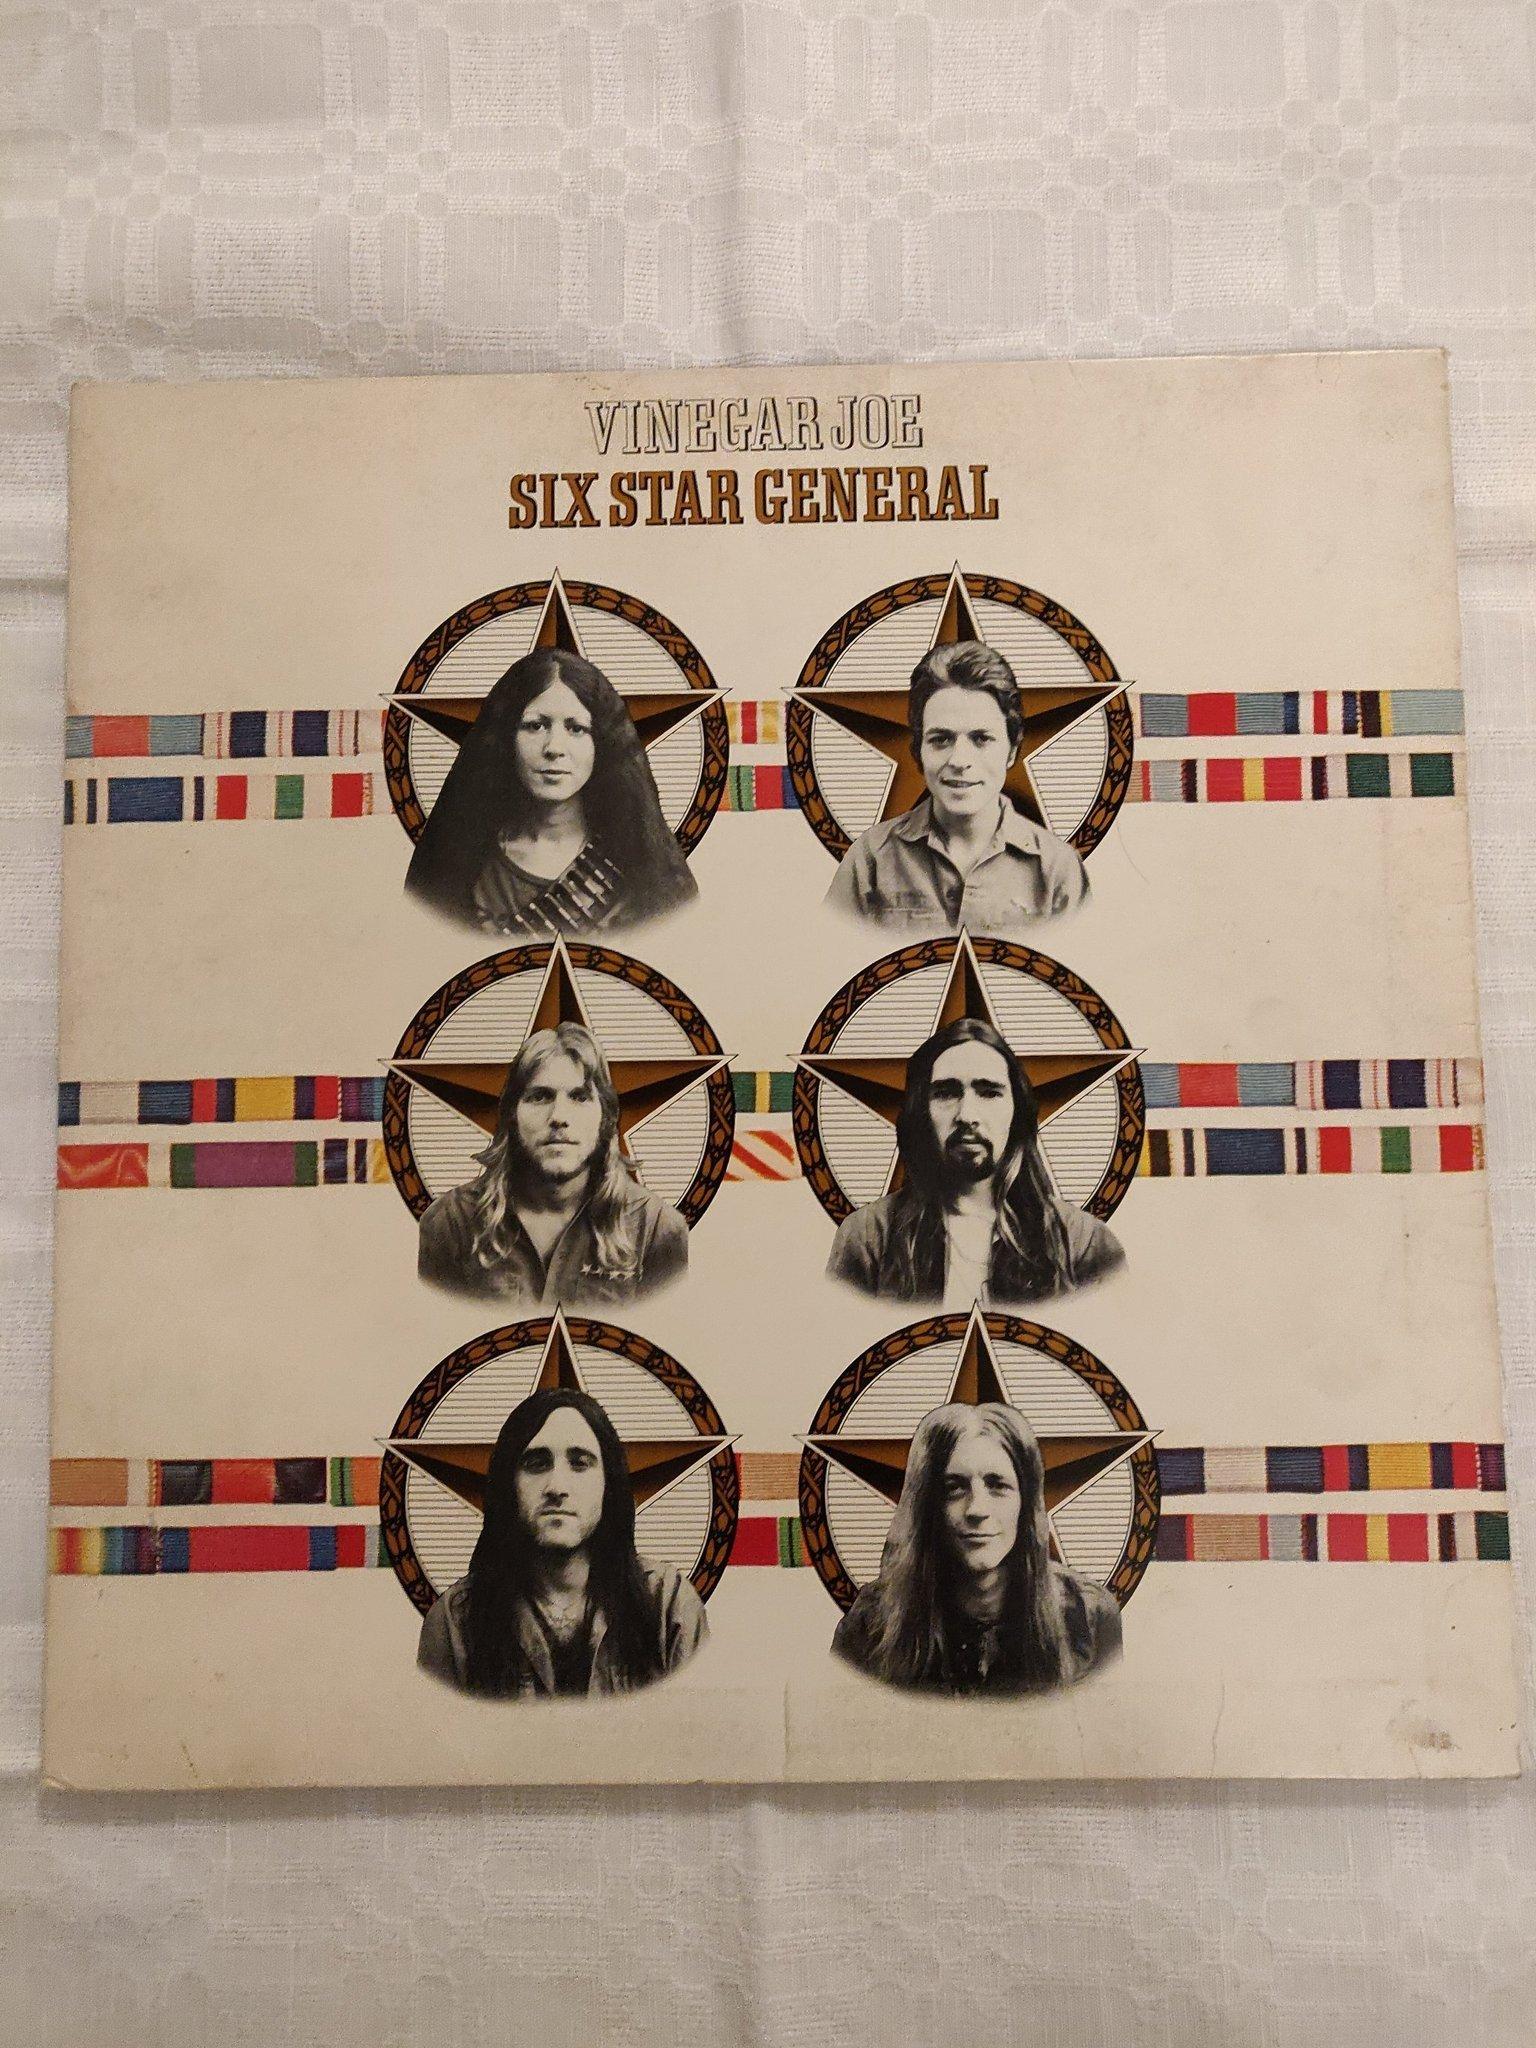 Vinegar Joe Six Star General Vinyl